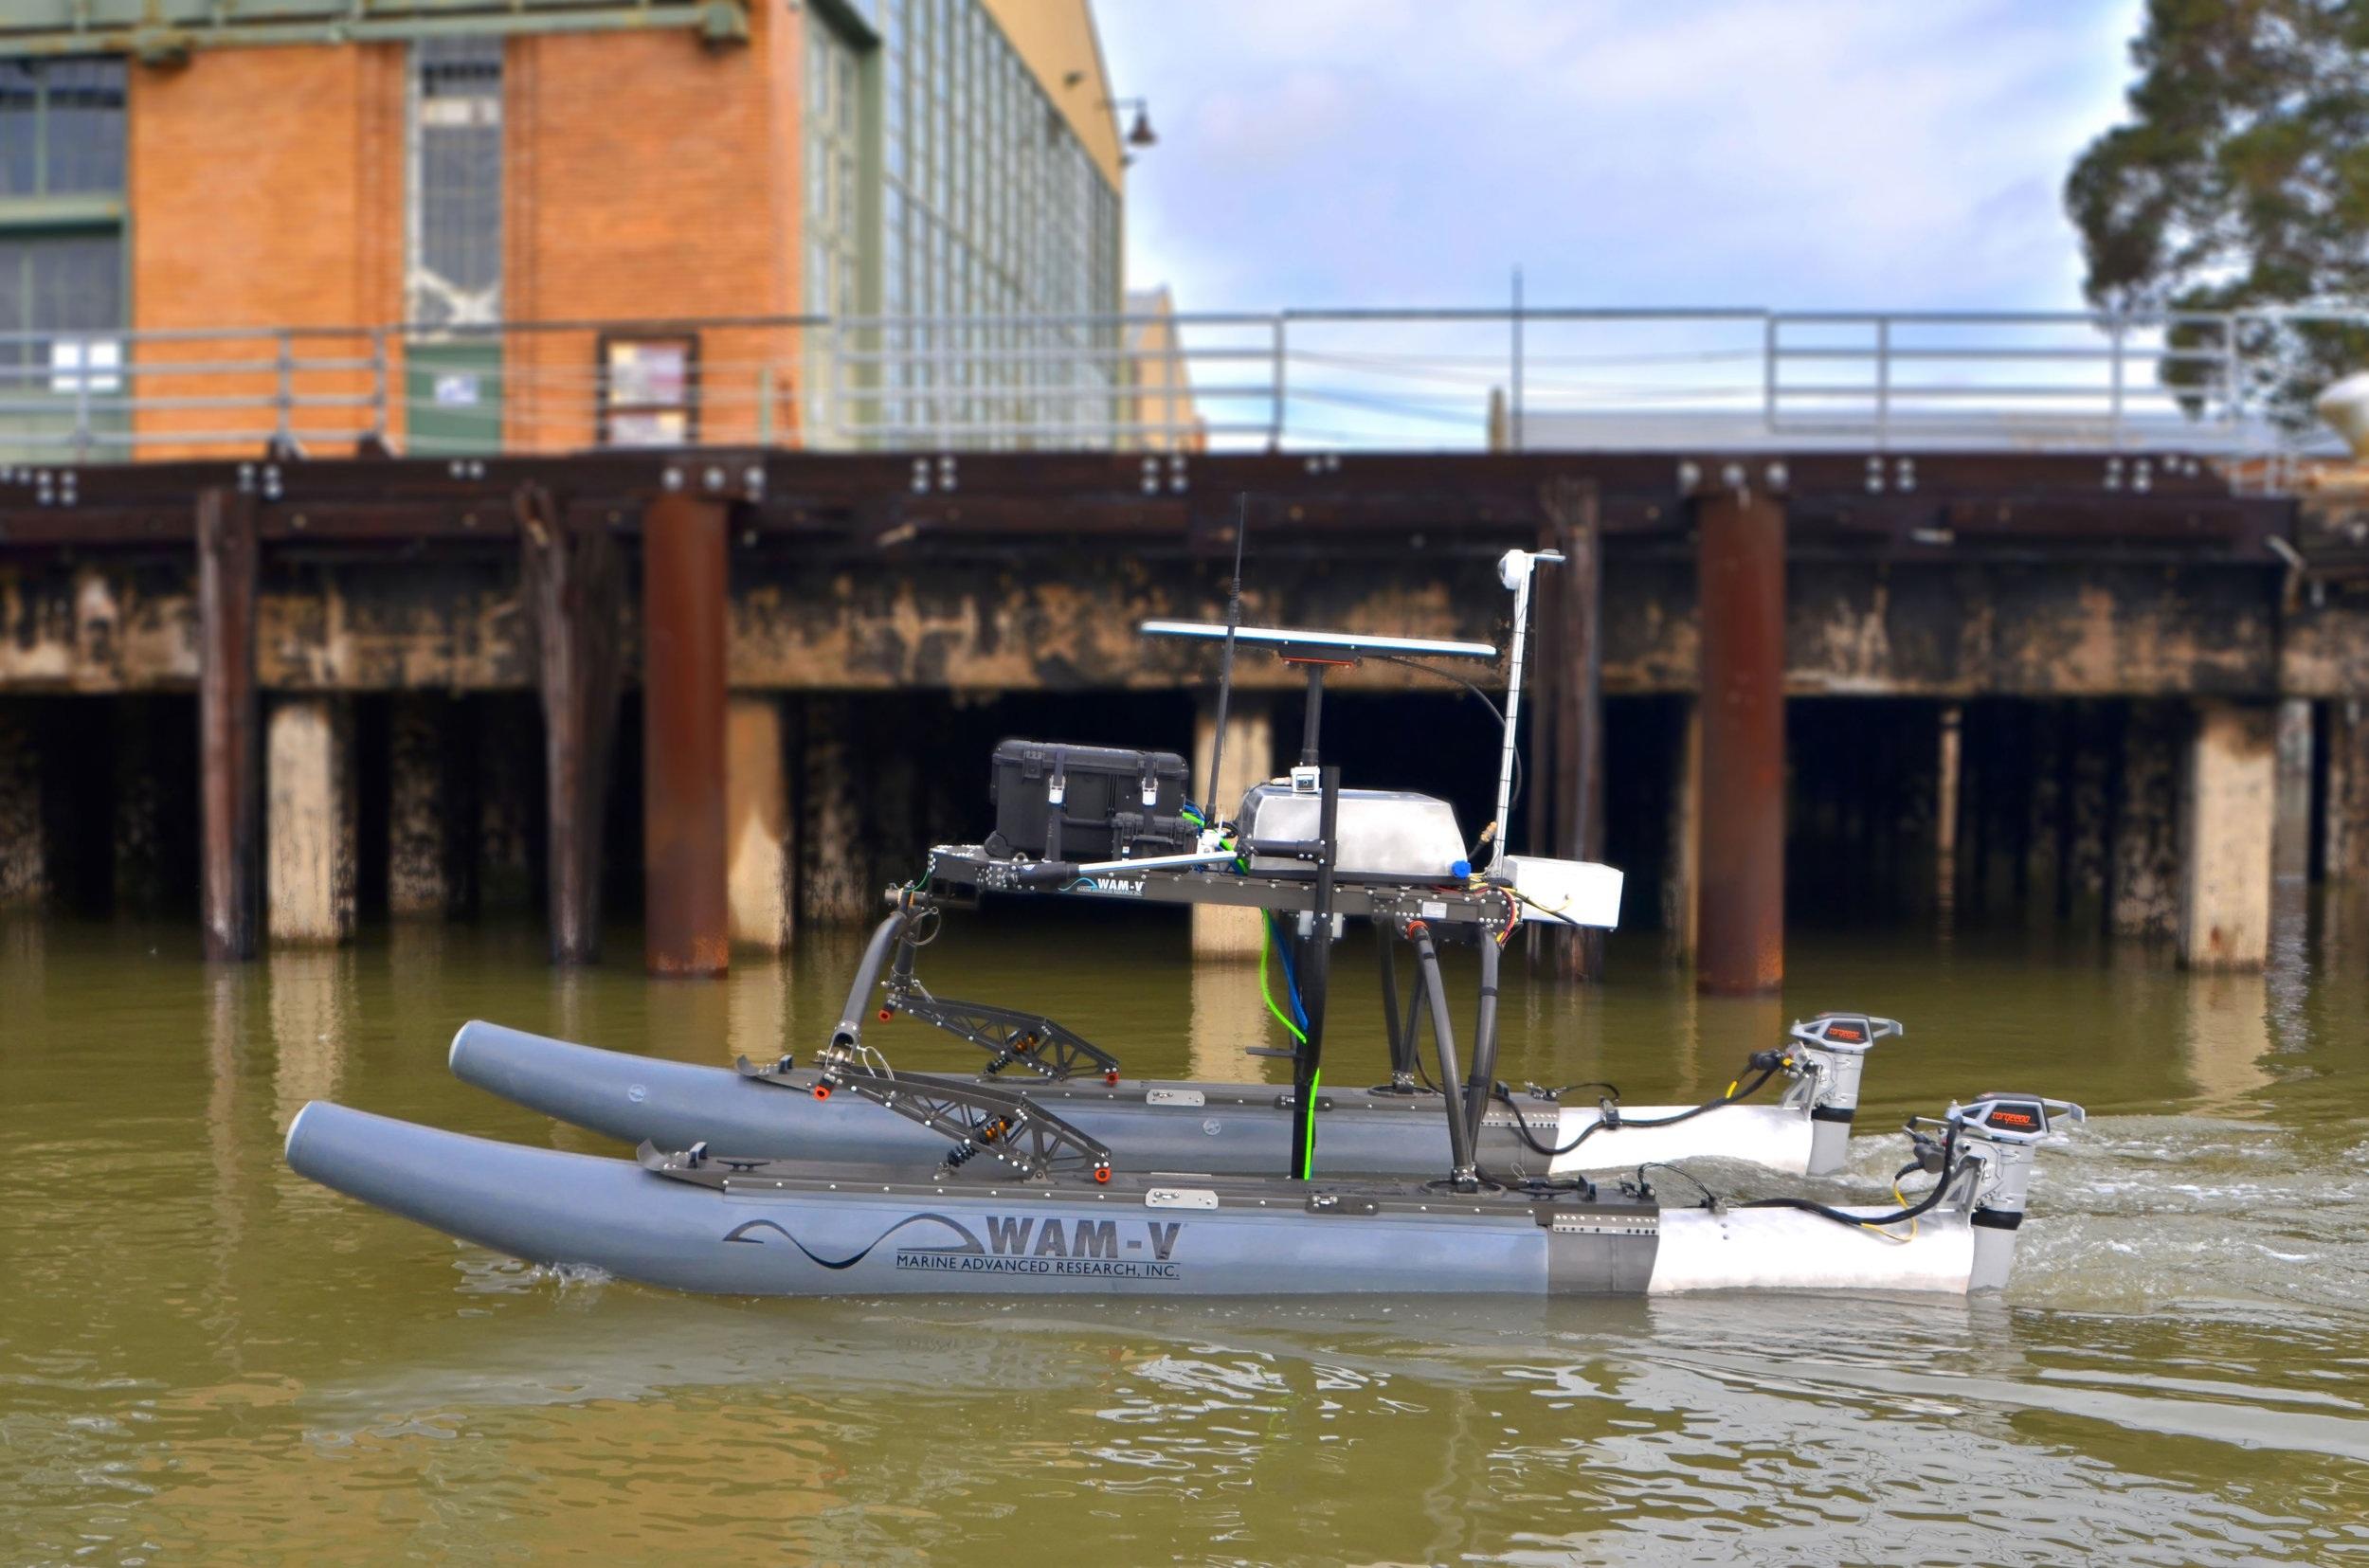 WAM-V 16 ASV with Kongsberg M3 Multibeam Echosounder